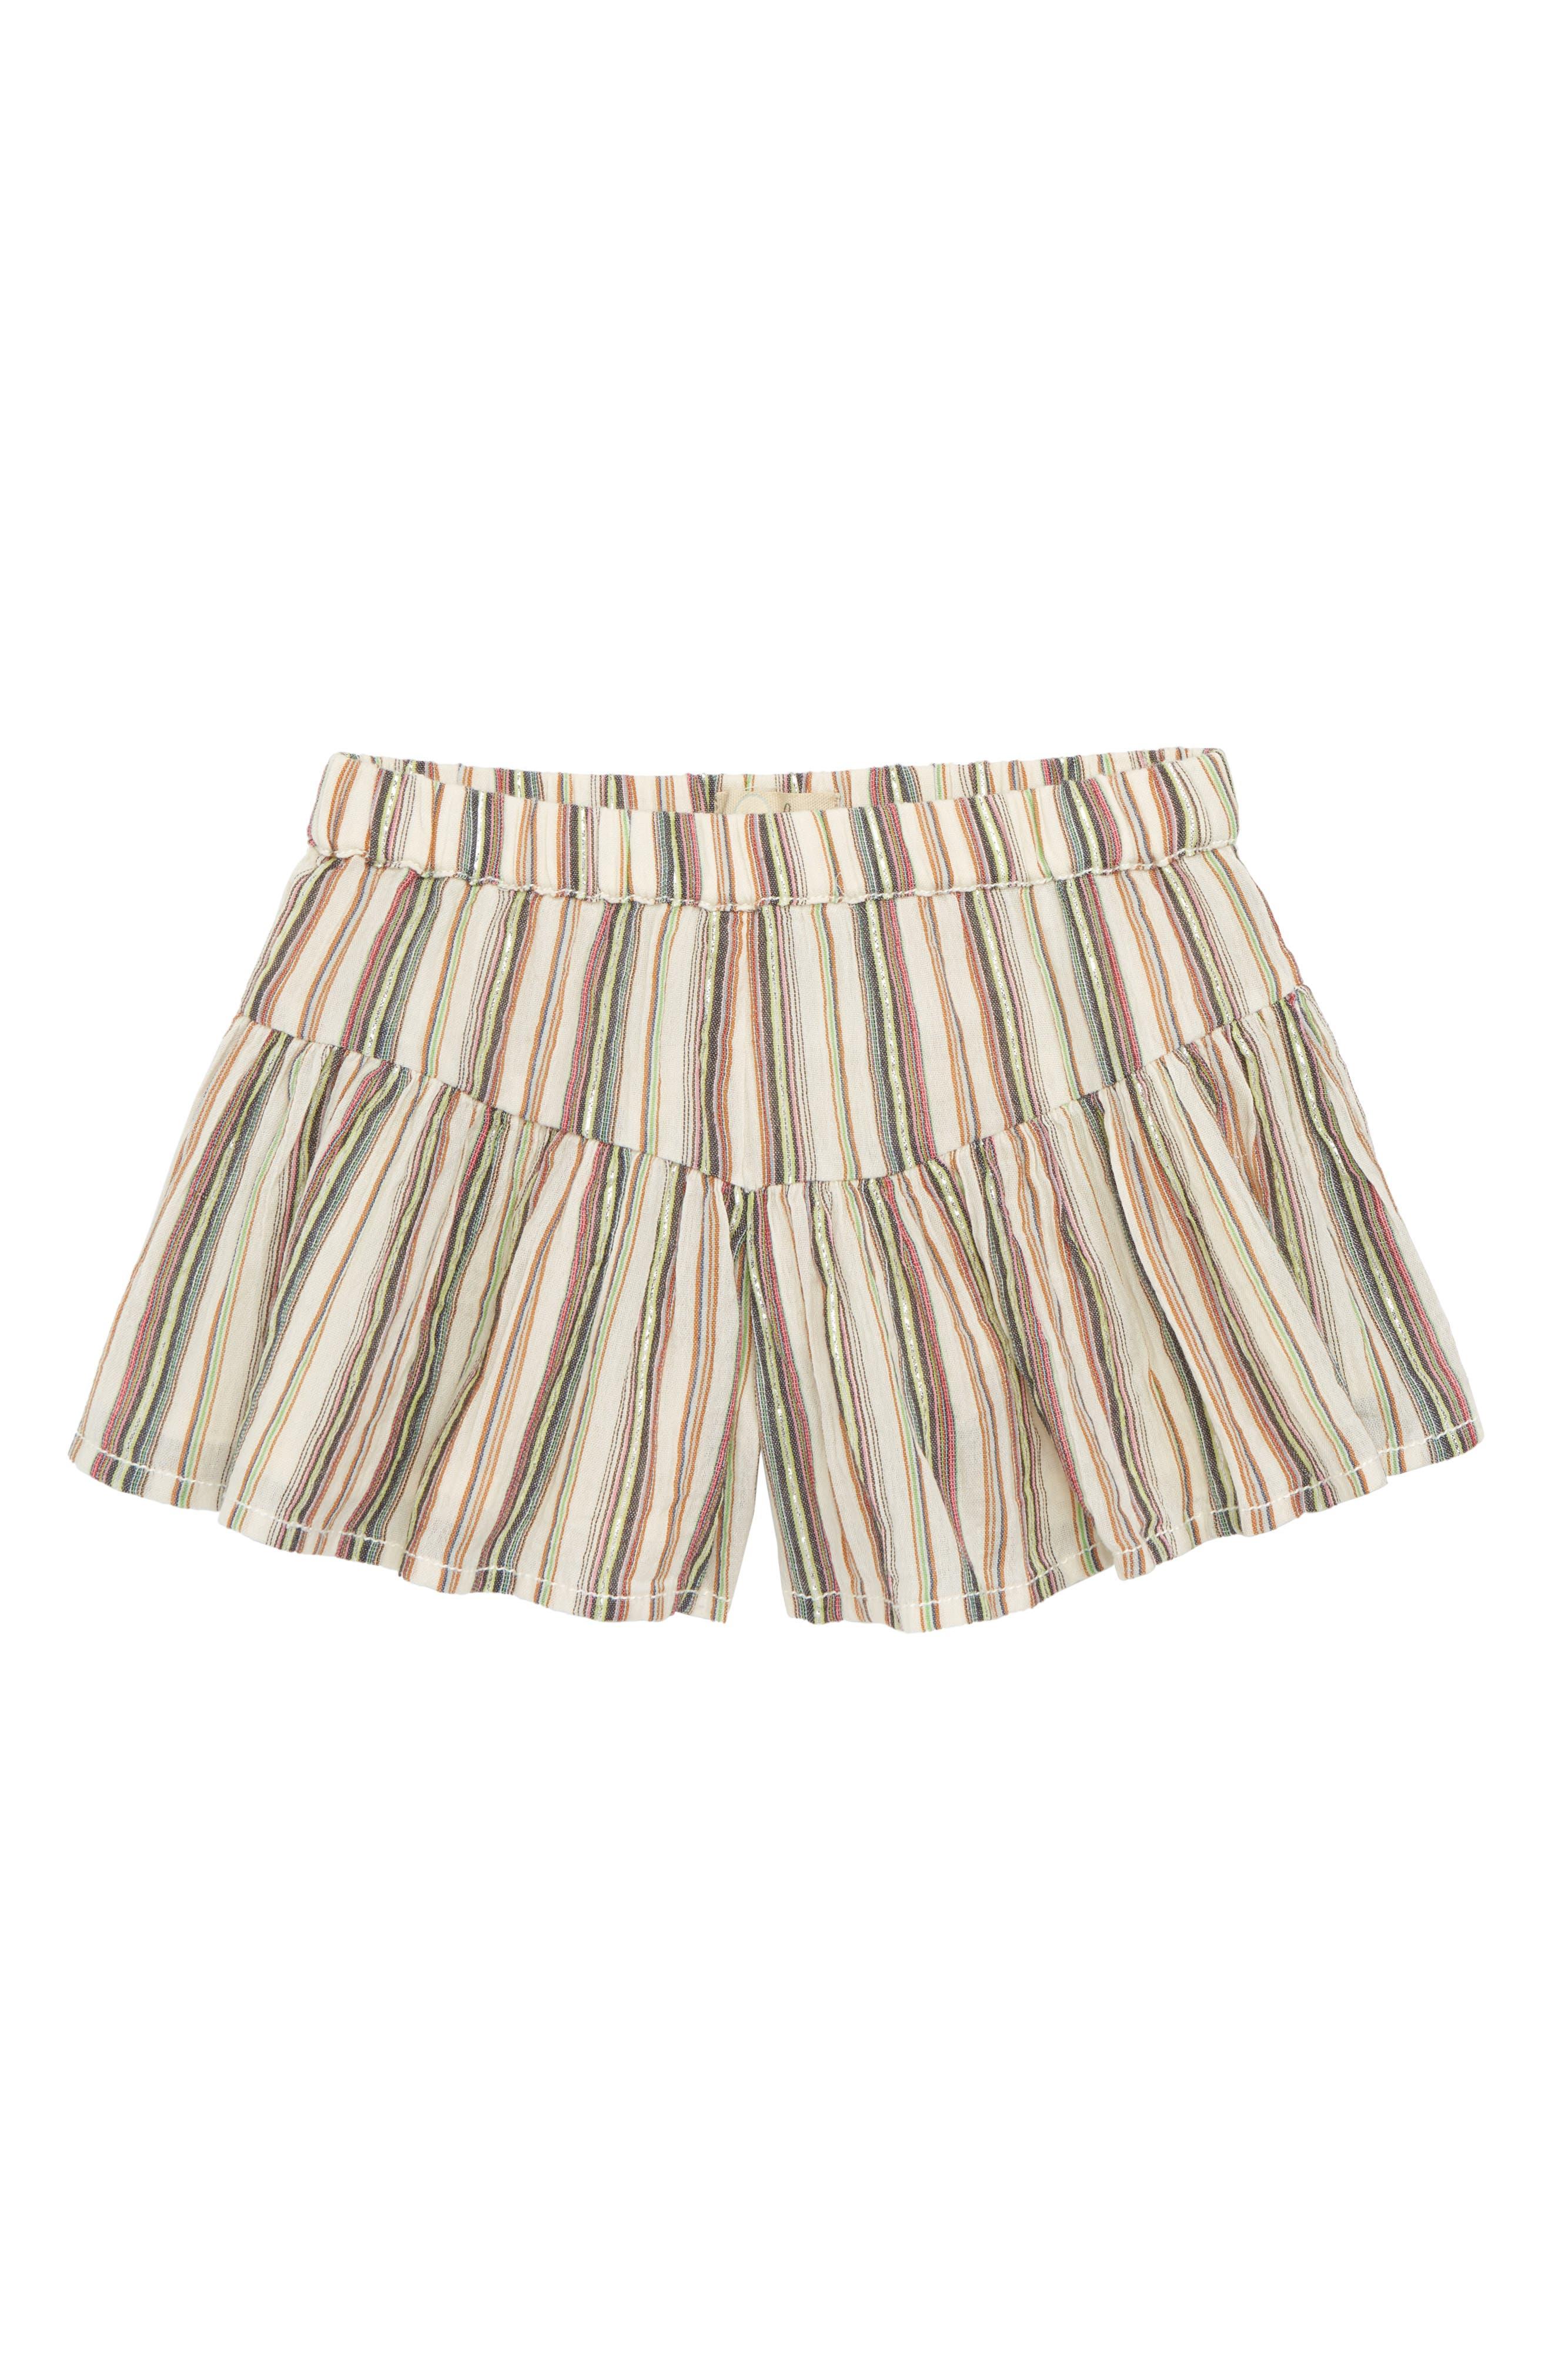 Nora Woven Shorts,                         Main,                         color, Ivory